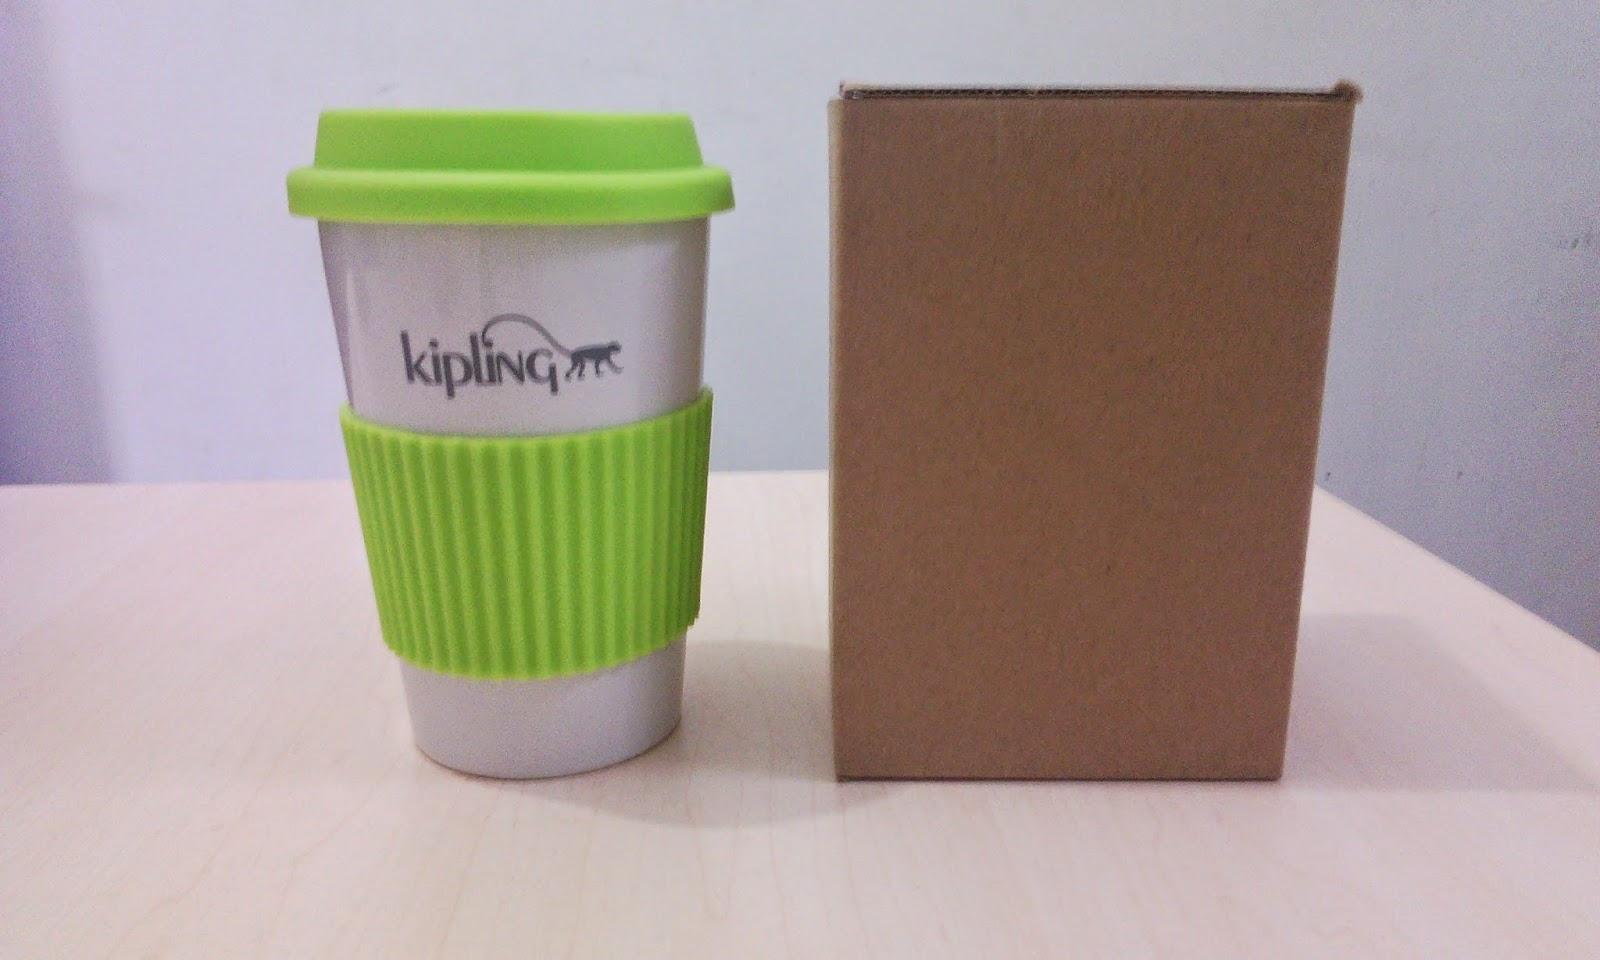 mug keramik mug murah mug rainbow mug cetak mug promosi